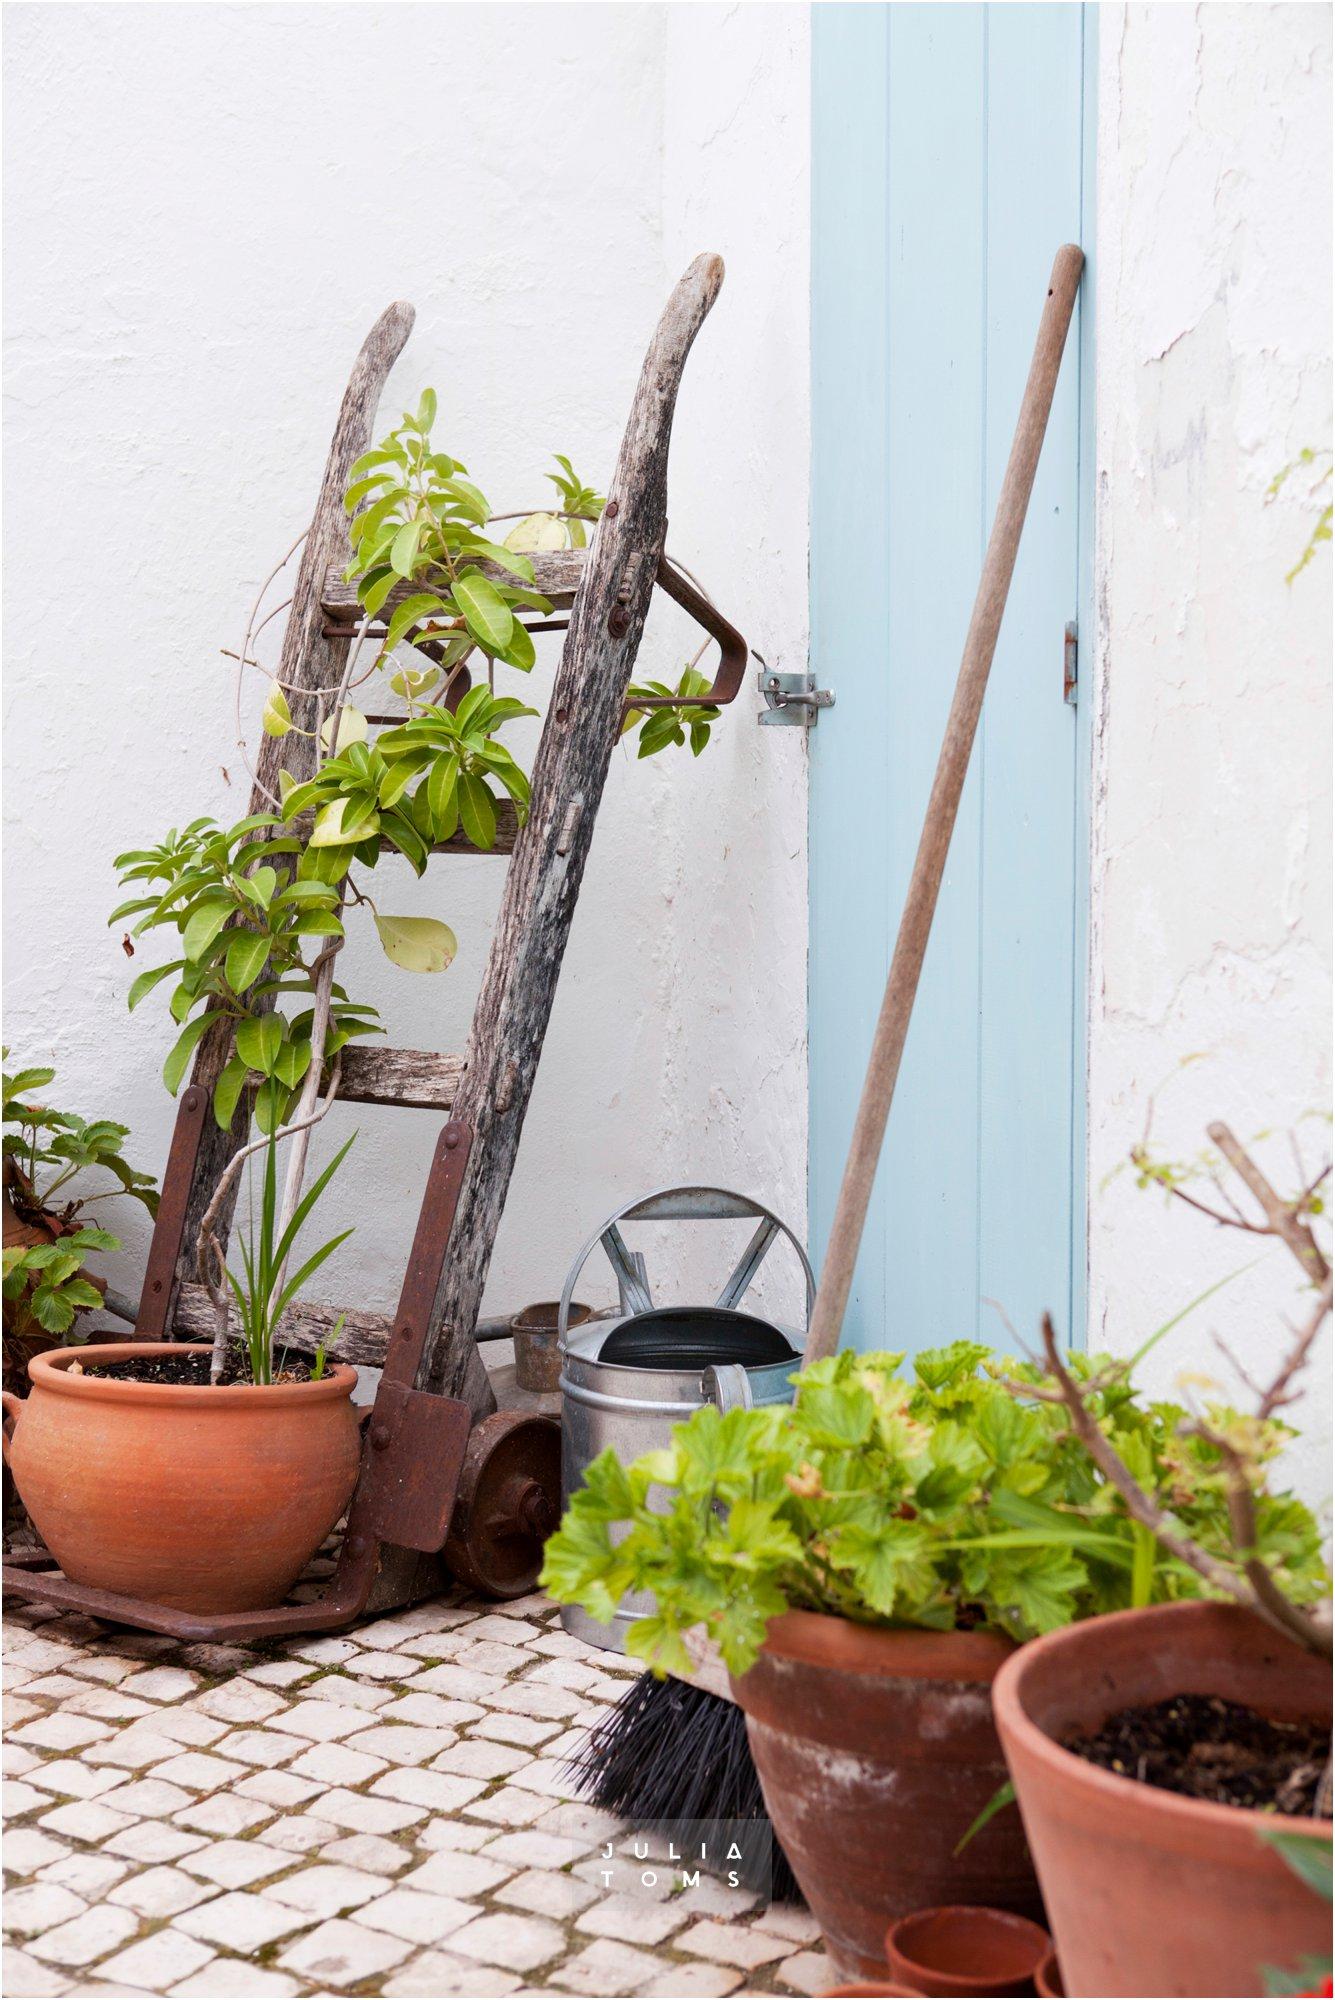 julia_toms_photography_interiors_magazine_019.jpg